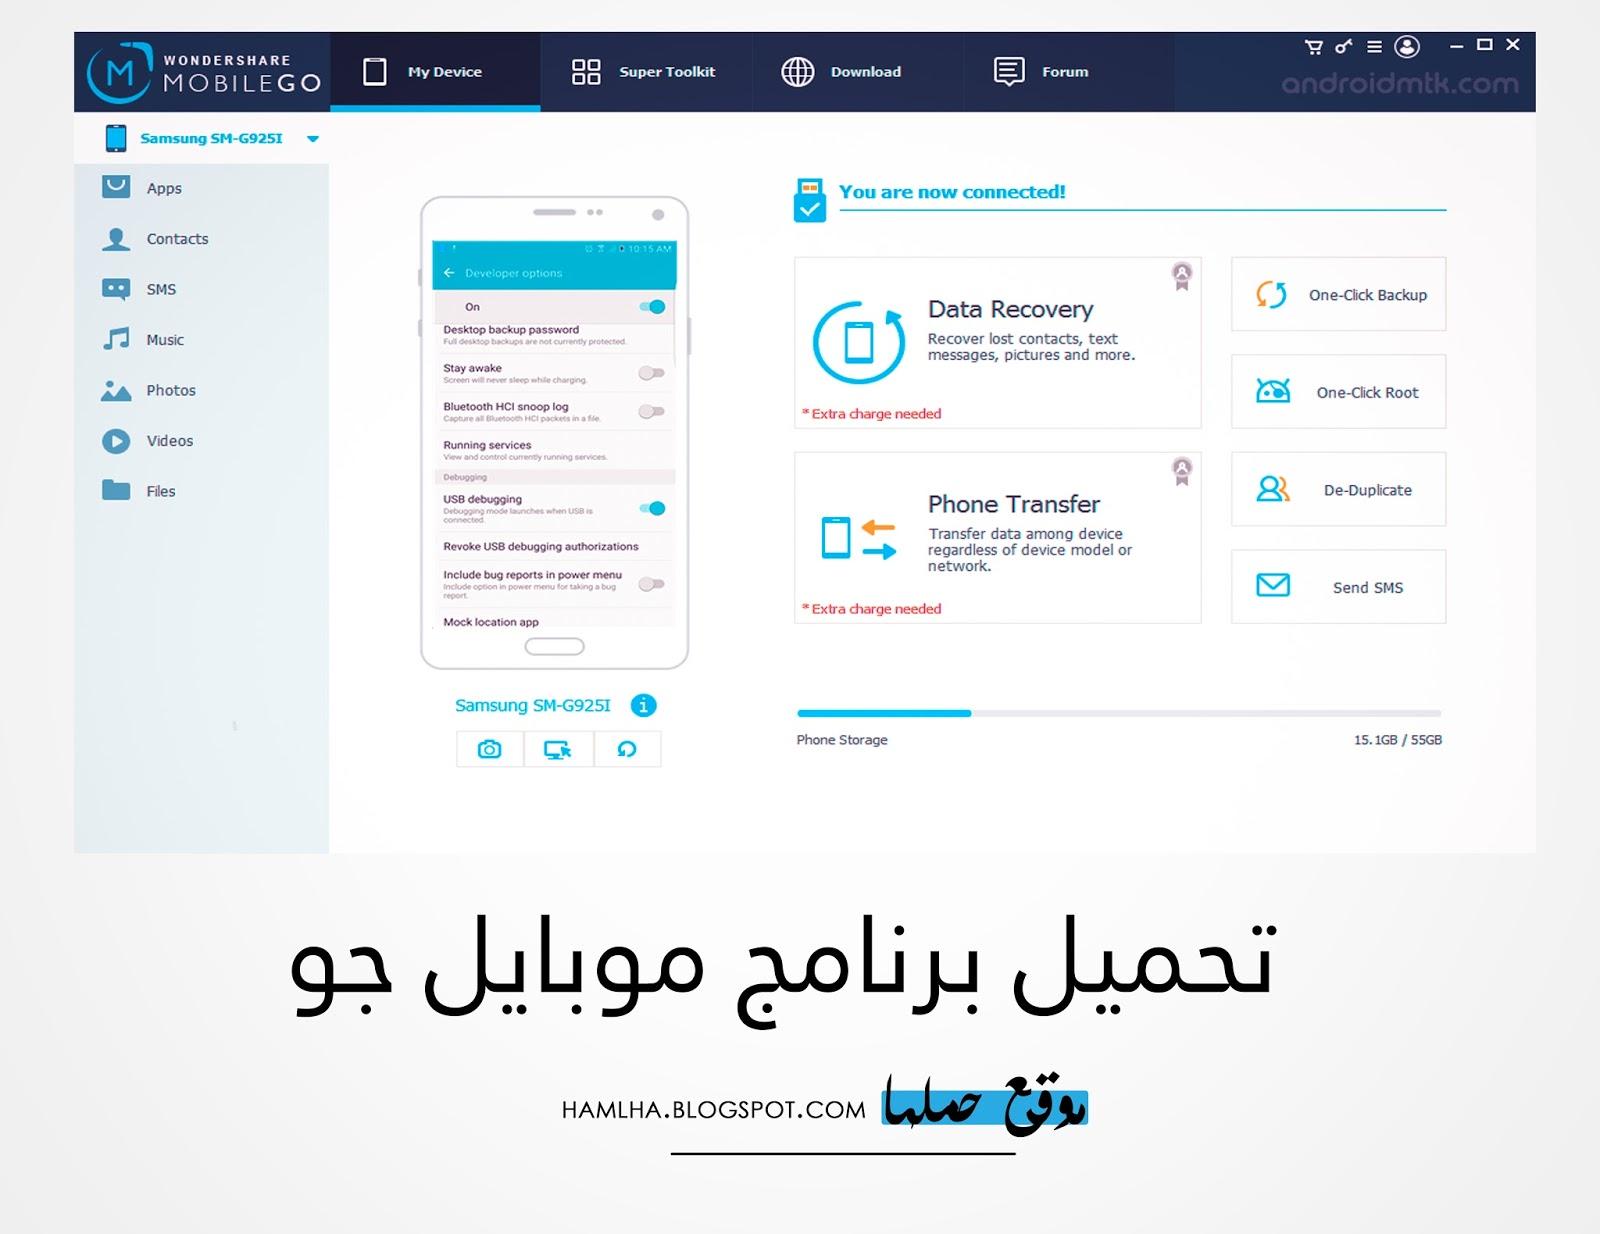 تحميل برنامج موبايل جو 2018 Download Mobilego لربط الهاتف